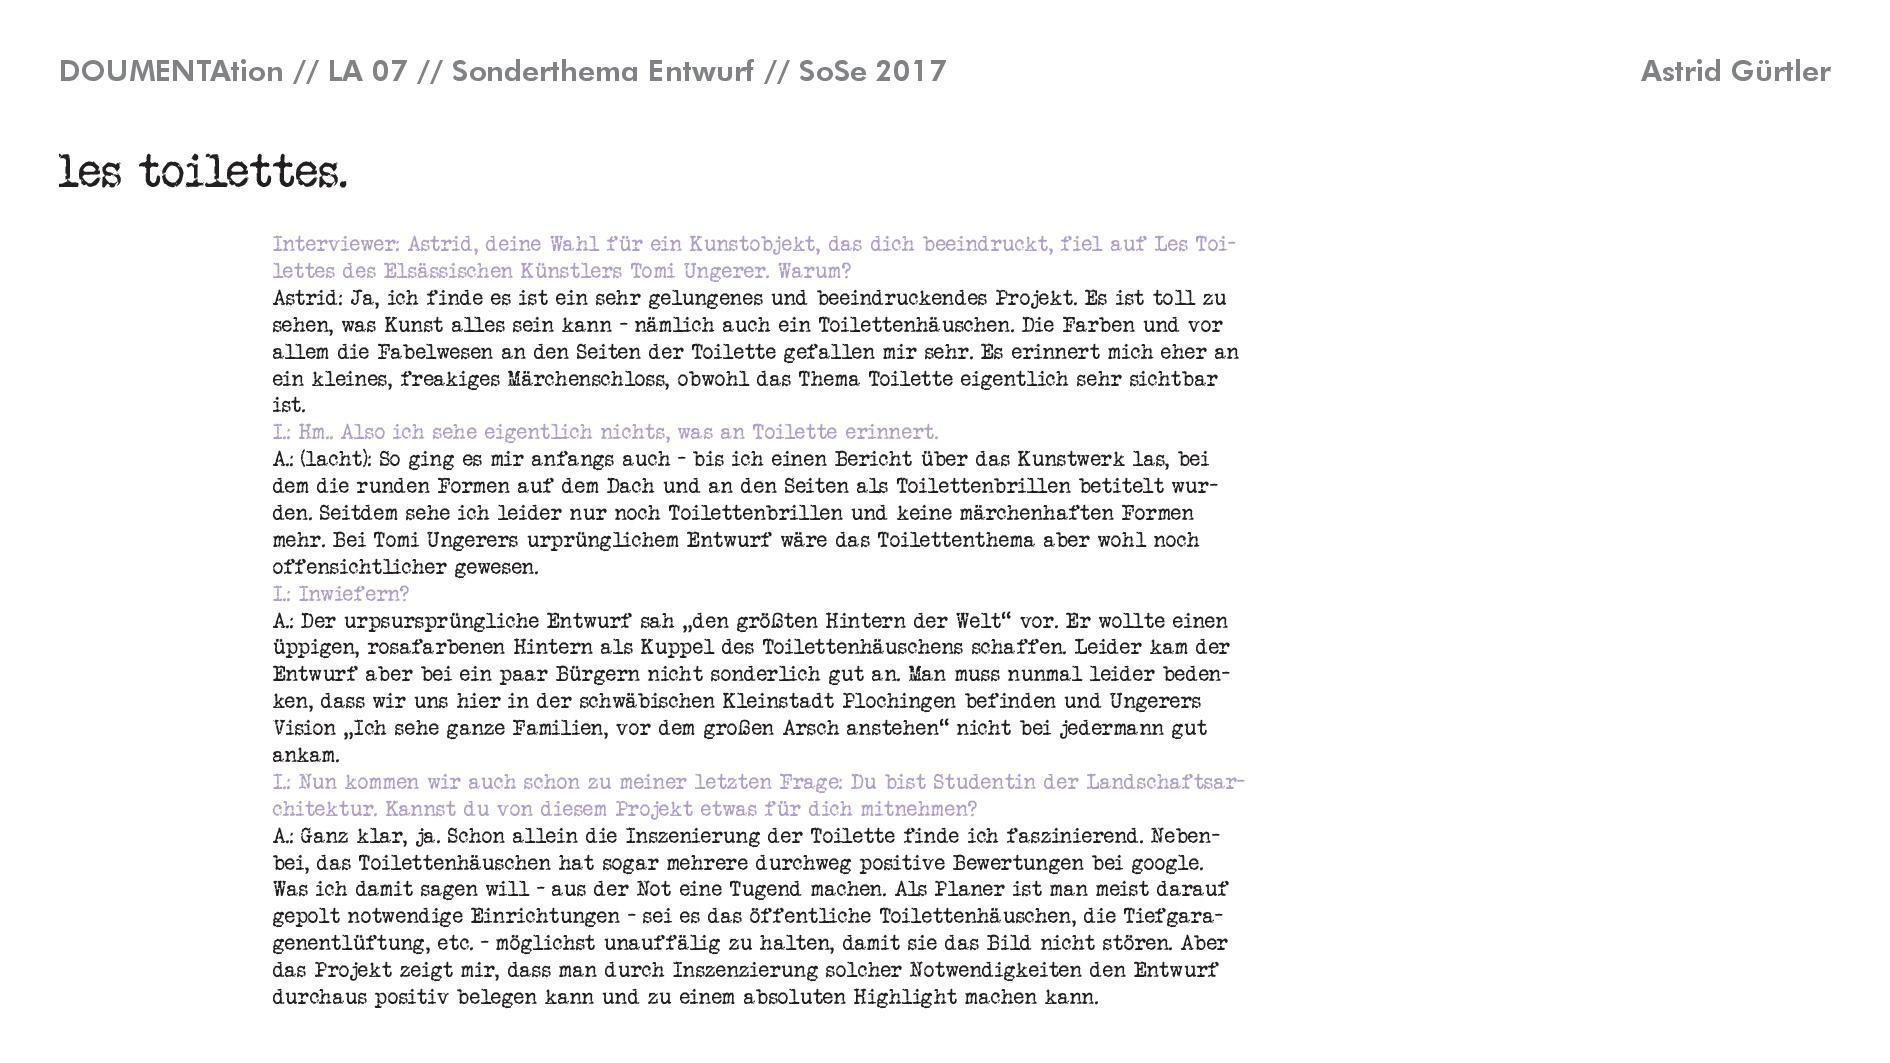 NEU Sonderthema Entwerfen SoSe 17 029